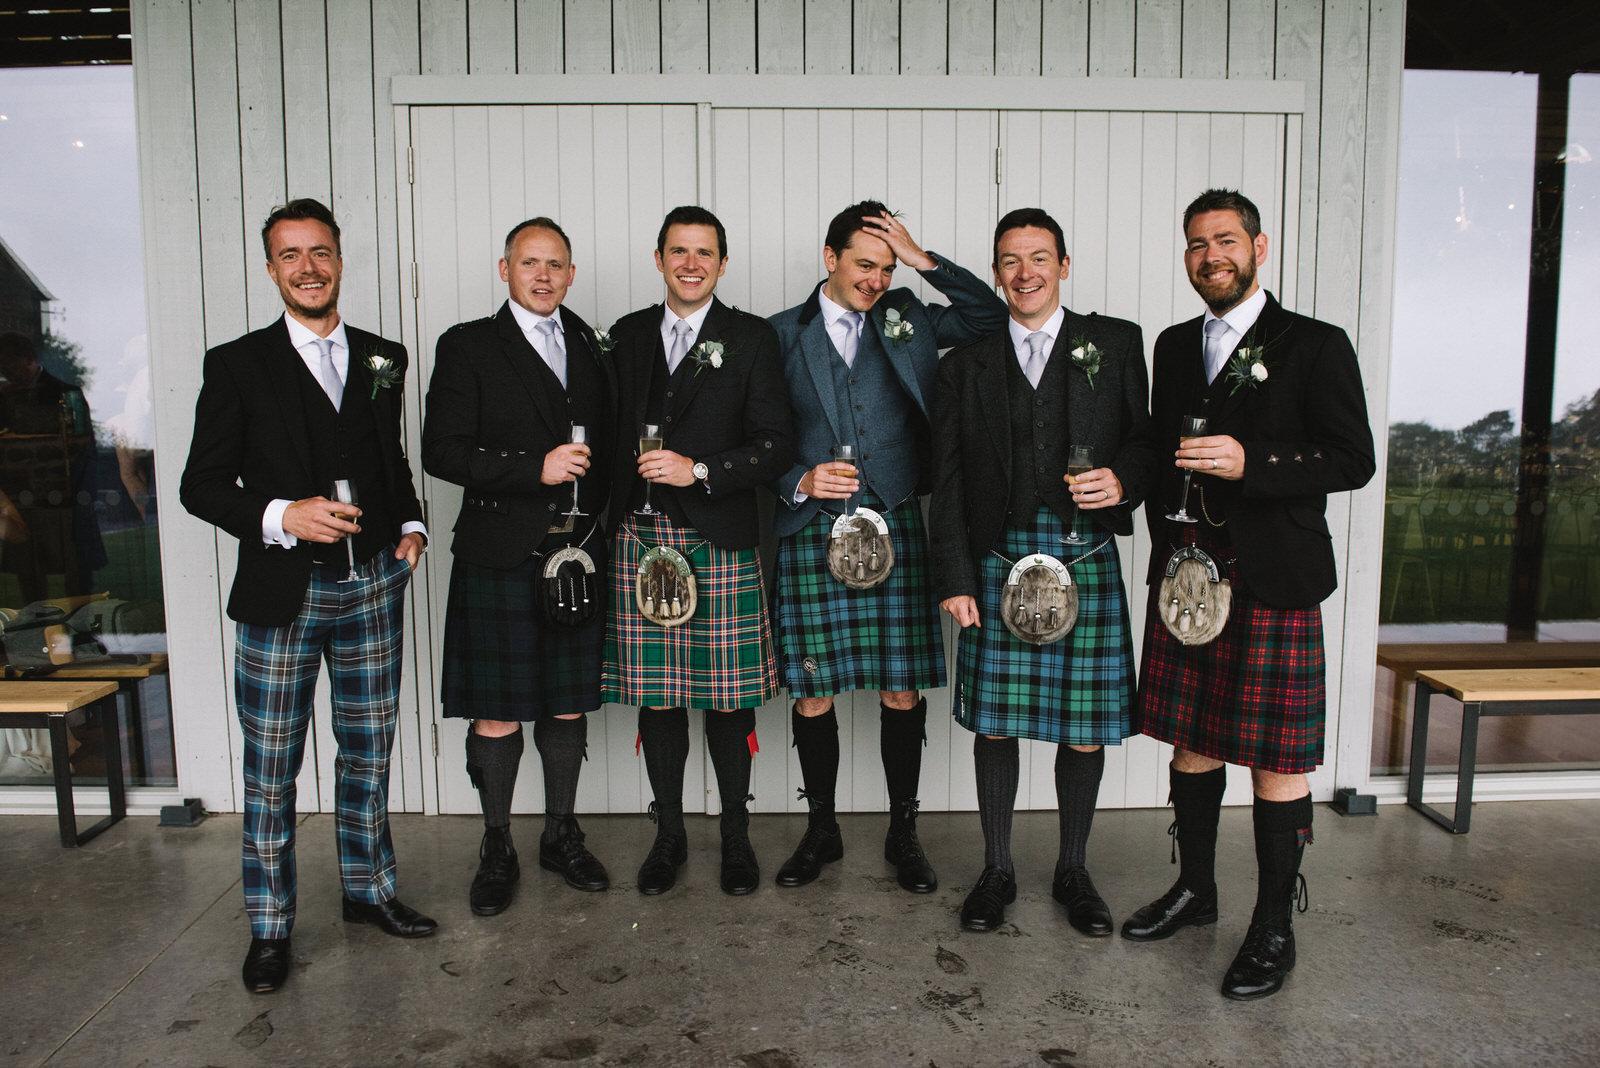 034-GUARDSWELL-FARM-WEDDING-ALTERNATIVE-SCOTTISH-WEDDING-PHOTOGRAPHER-SCOTTISH-WEDDING-DESTINATION-WEDDING-PHOTOGRAPHER.JPG